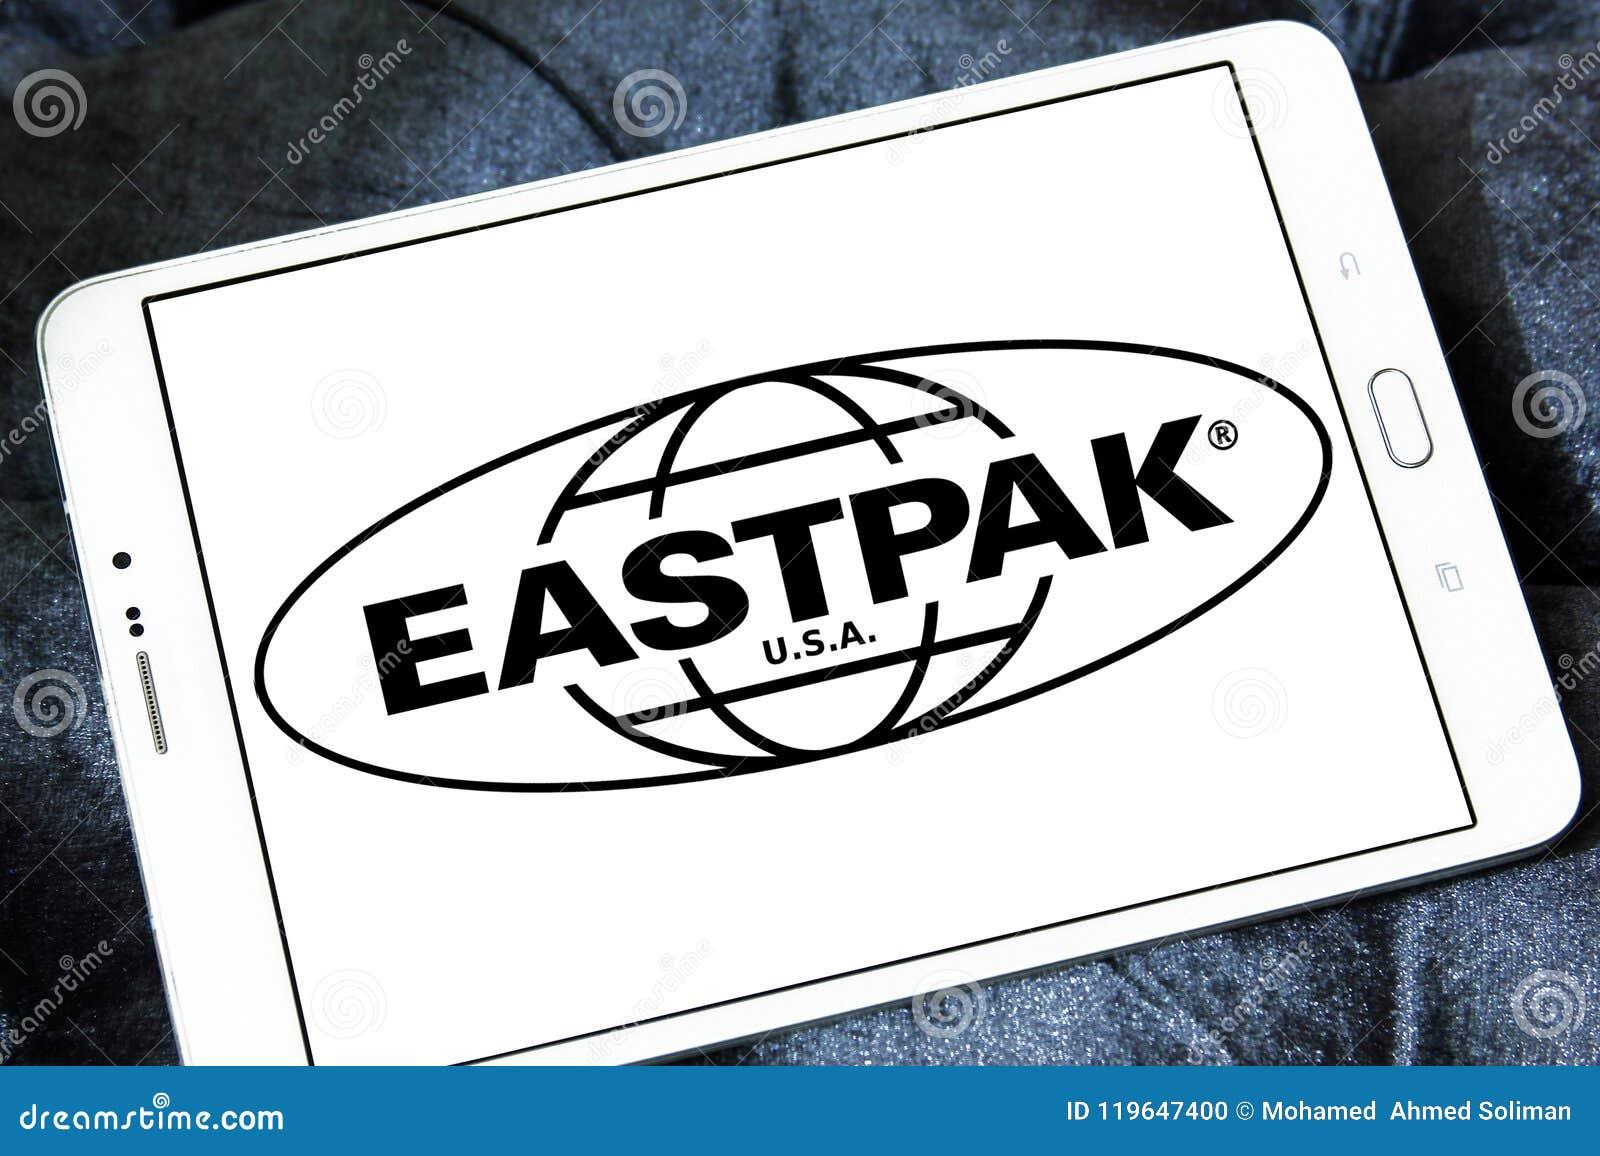 Eastpak company logo editorial image  Image of brands - 119647400